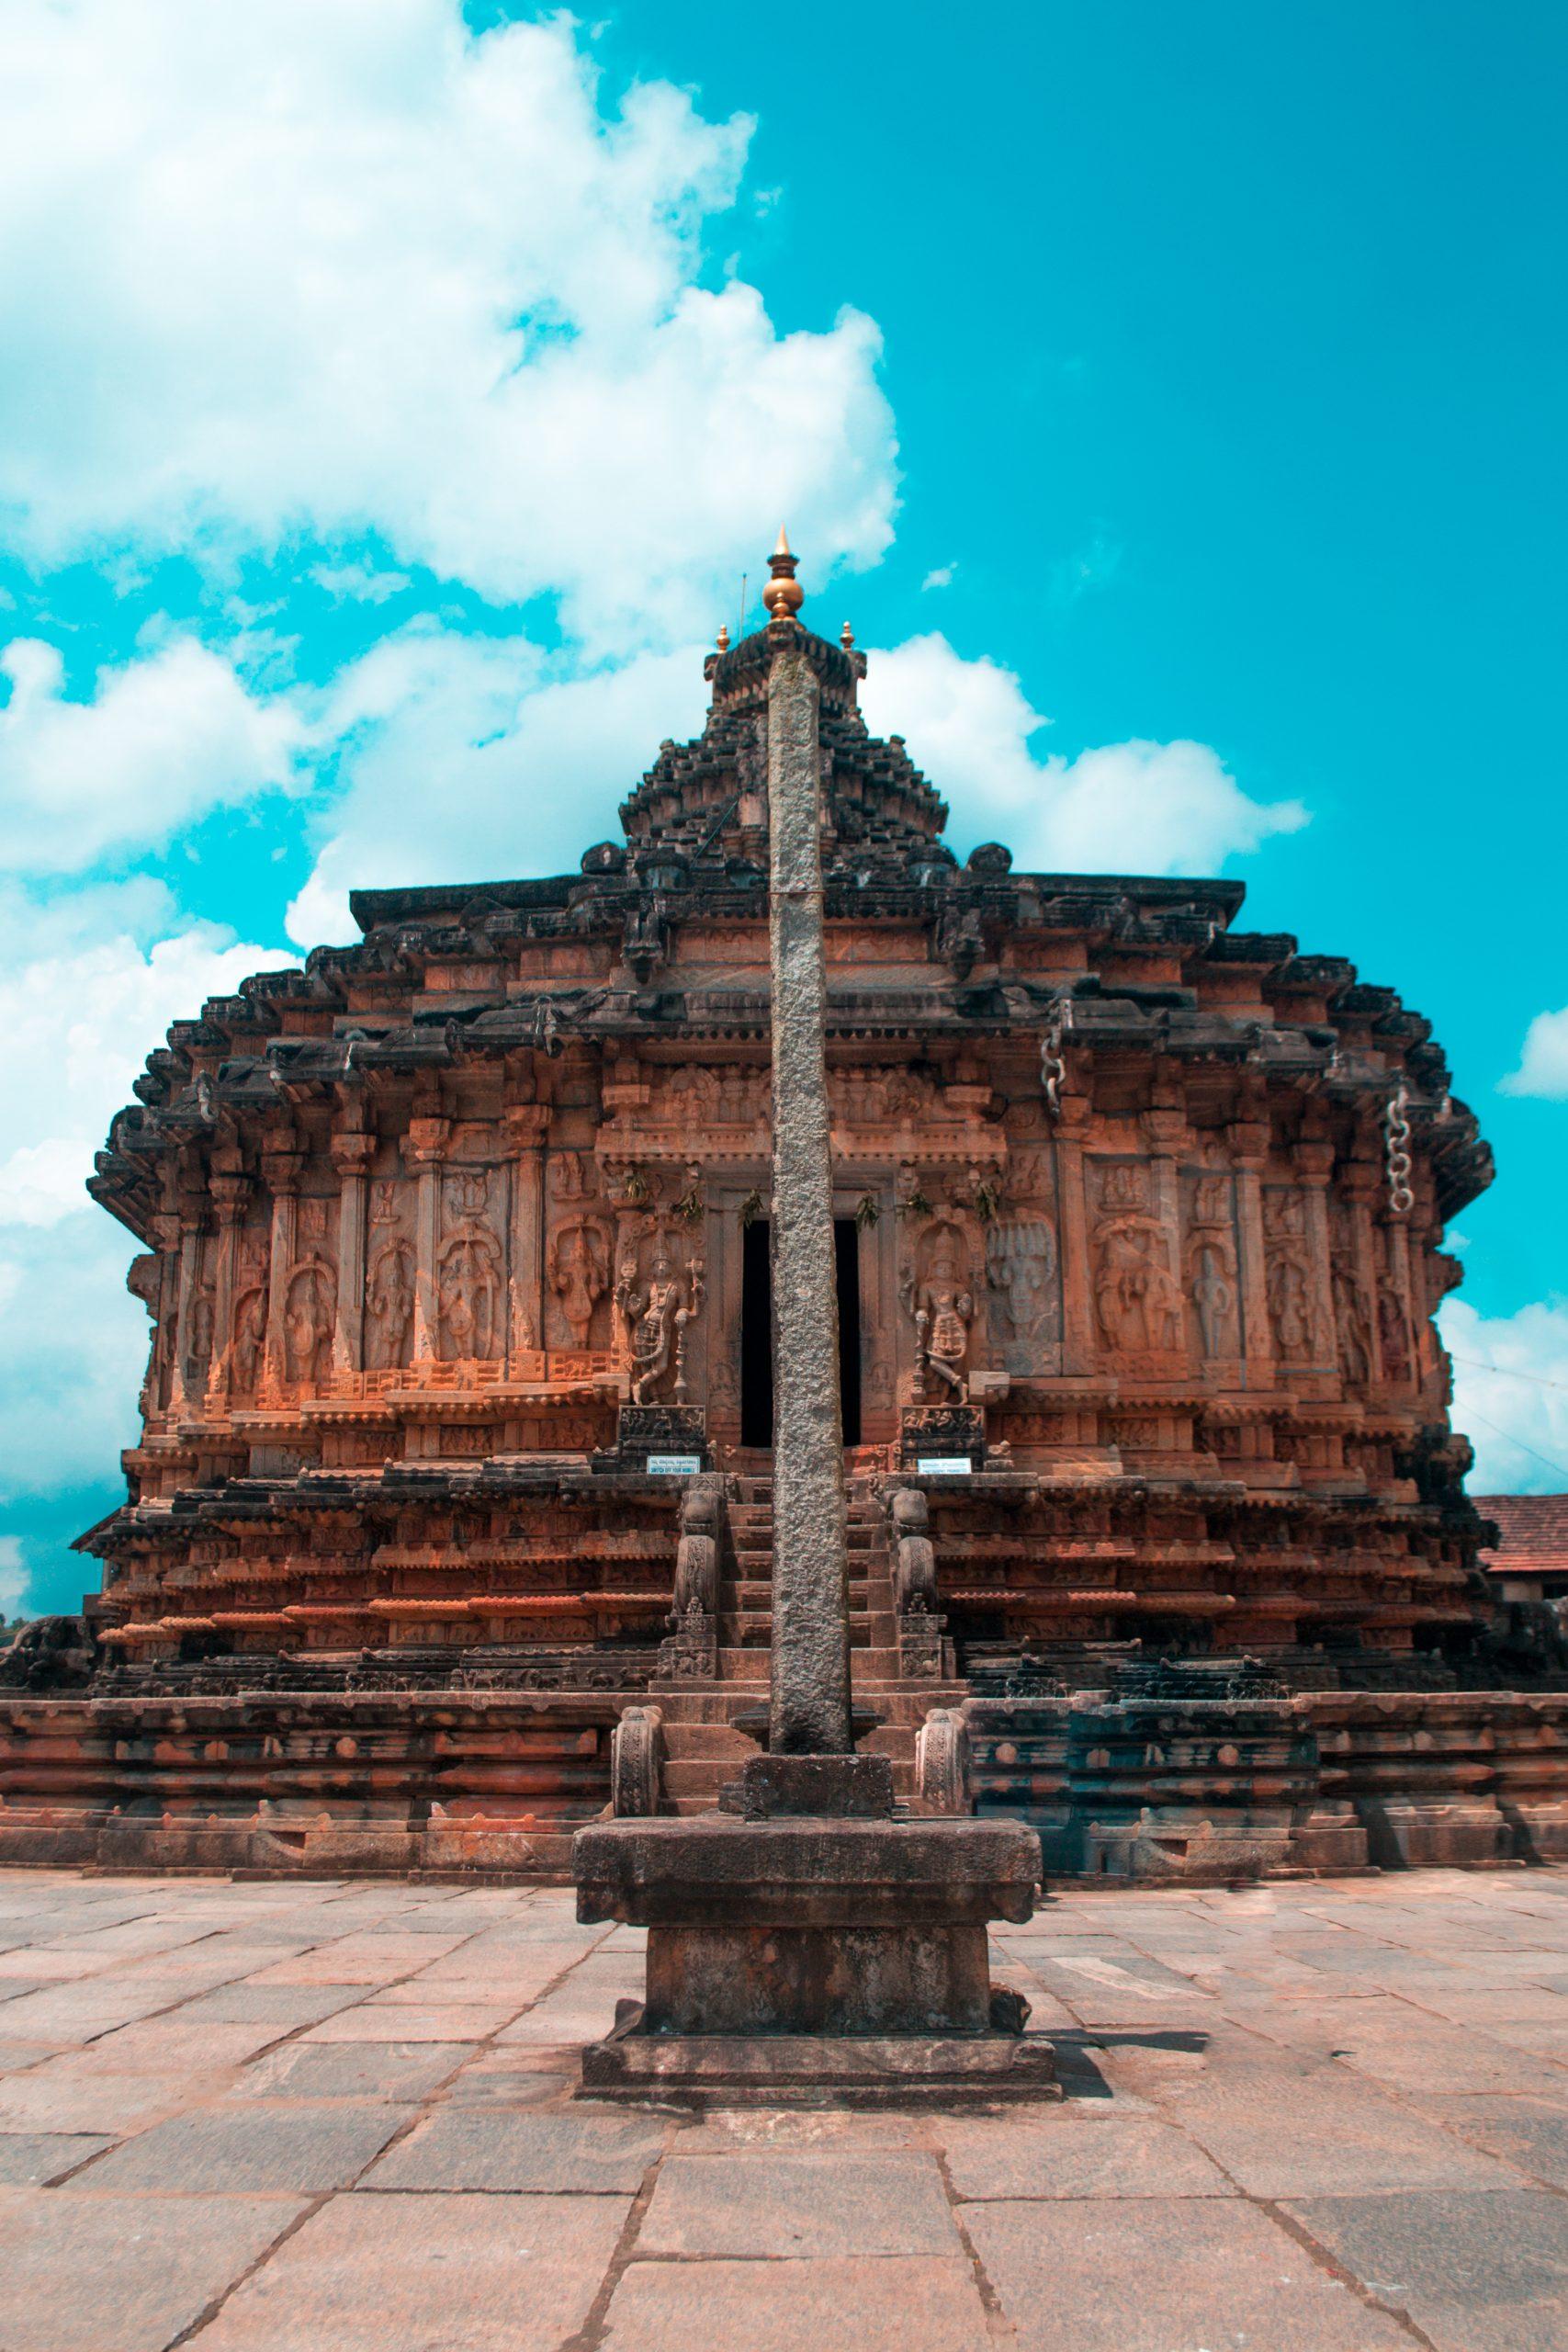 The Architectural Eminence of Sri Vidyashankara Temple